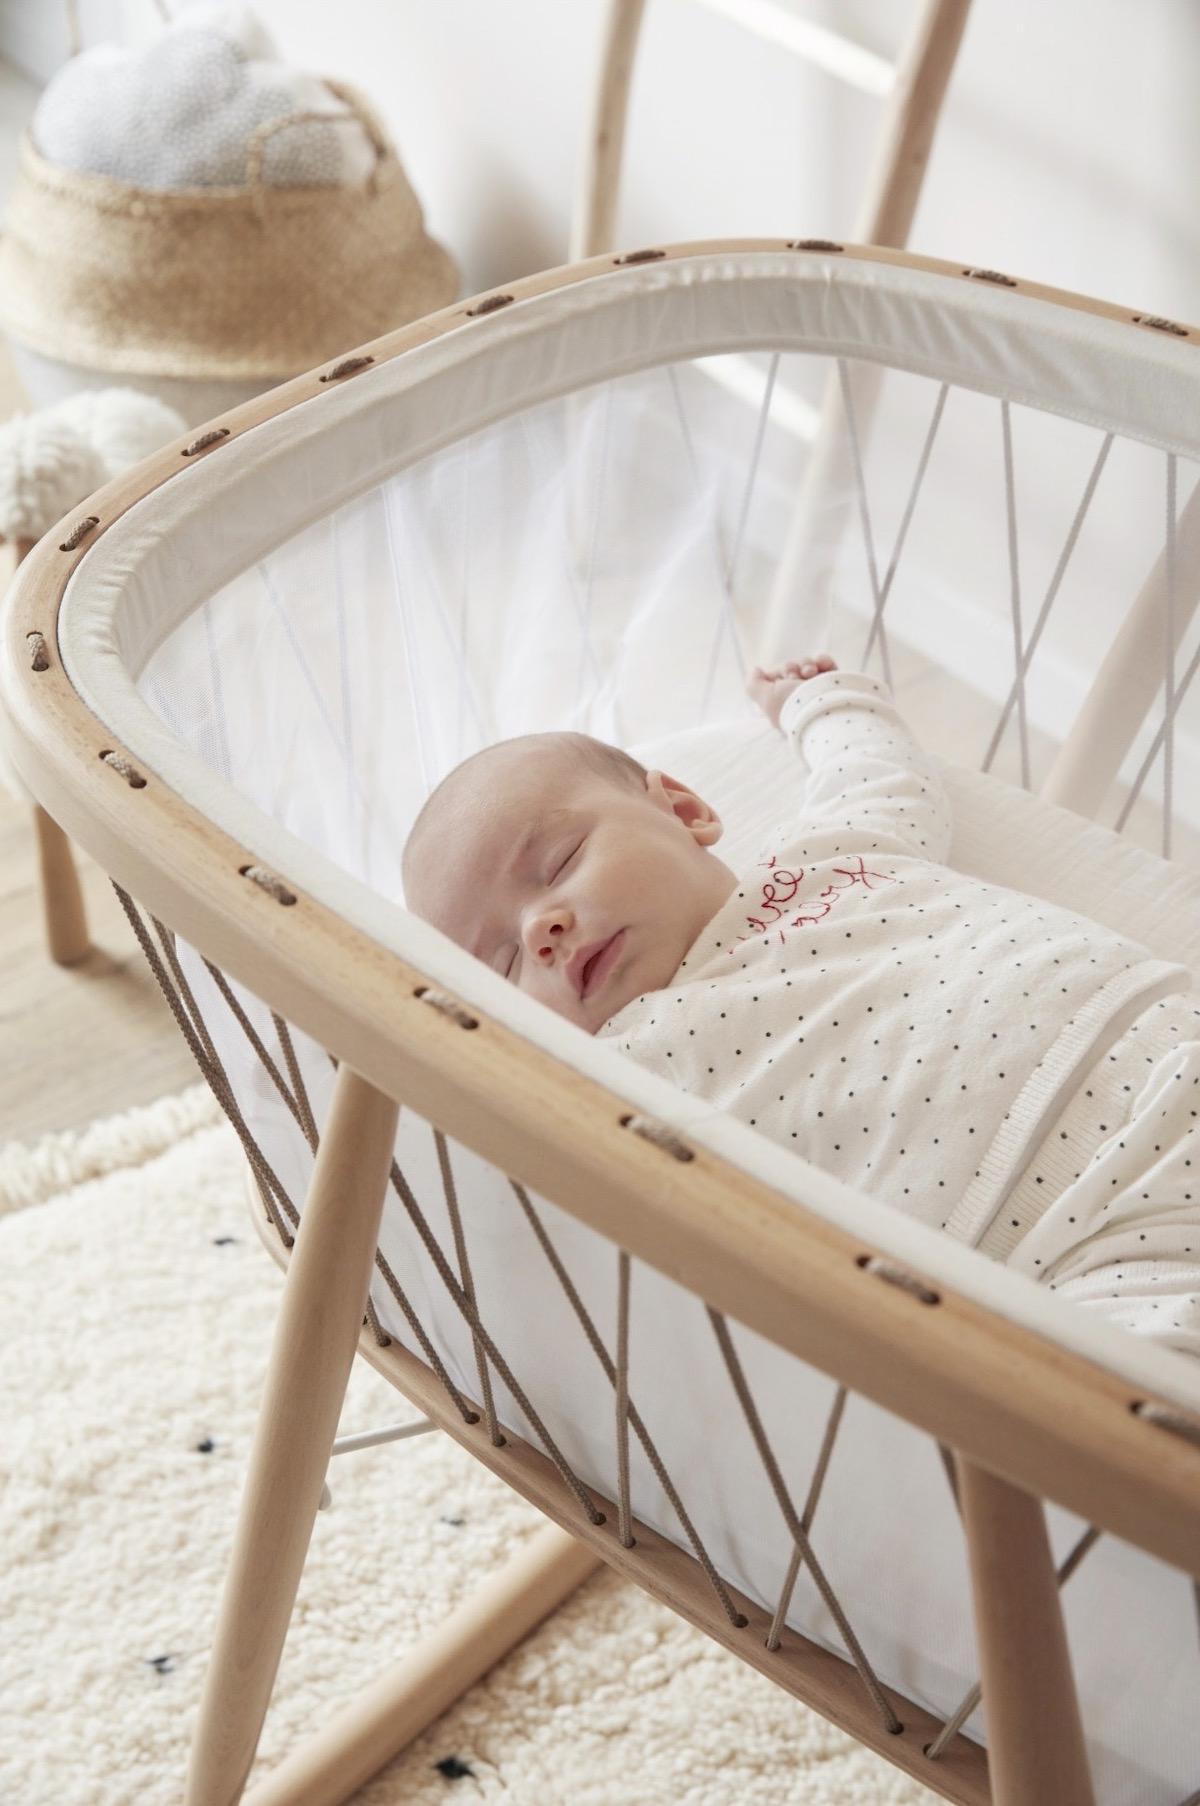 berceau kumi charlycrane chambre bébé - blog déco - clemaroundthecorner